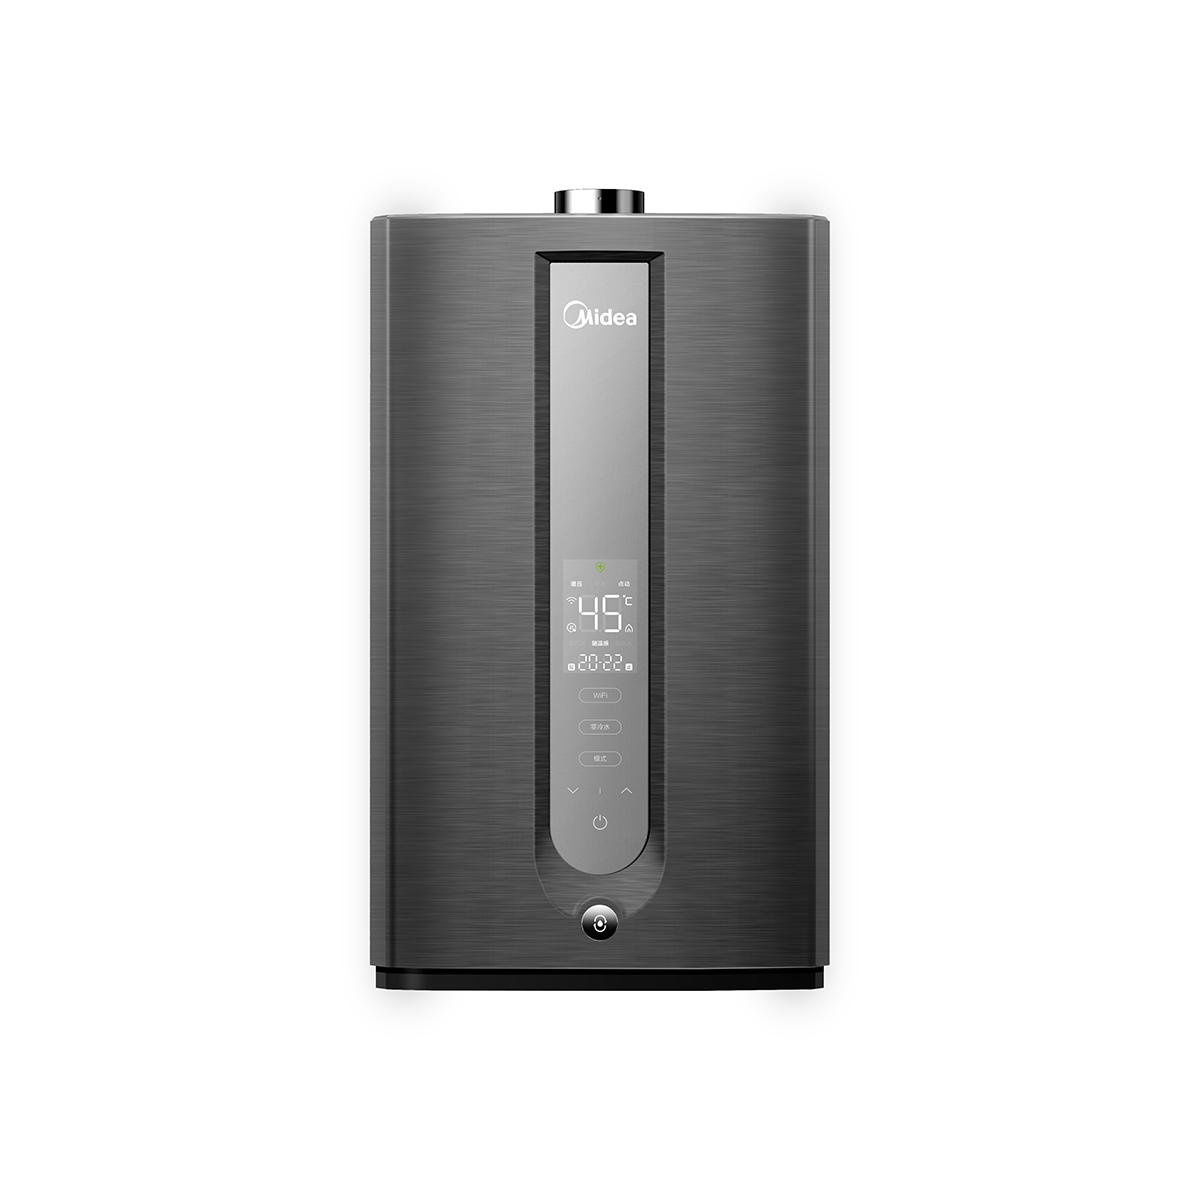 Midea/美的 JSQ30-Y9燃气热水器 说明书.pdf